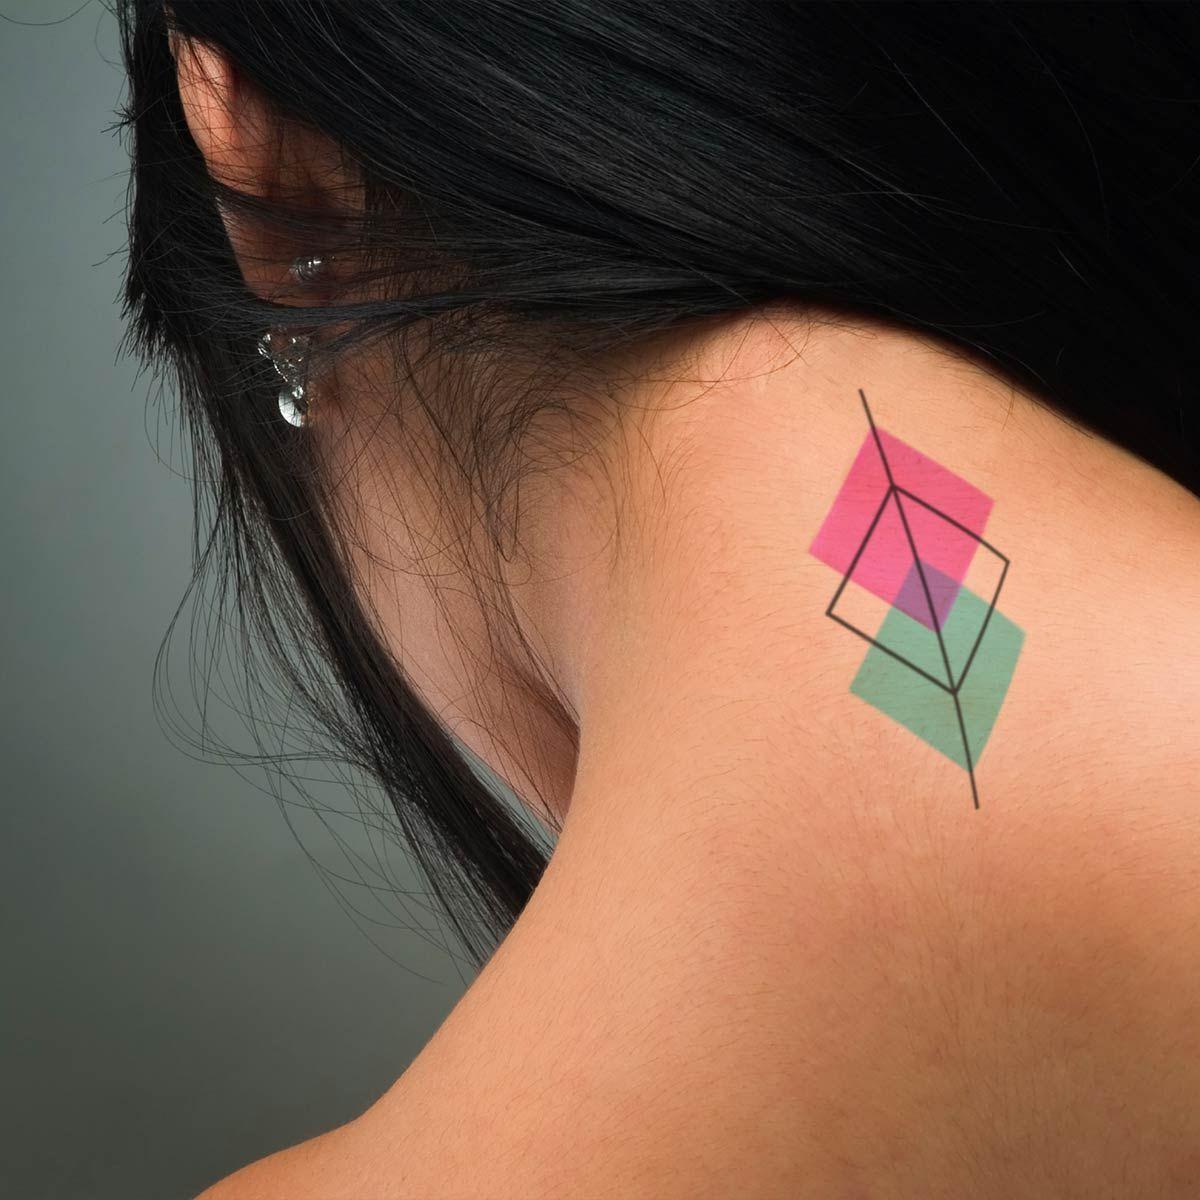 Design Your Own Temporary Tattoos Tattoos Temporary Tattoo Diy